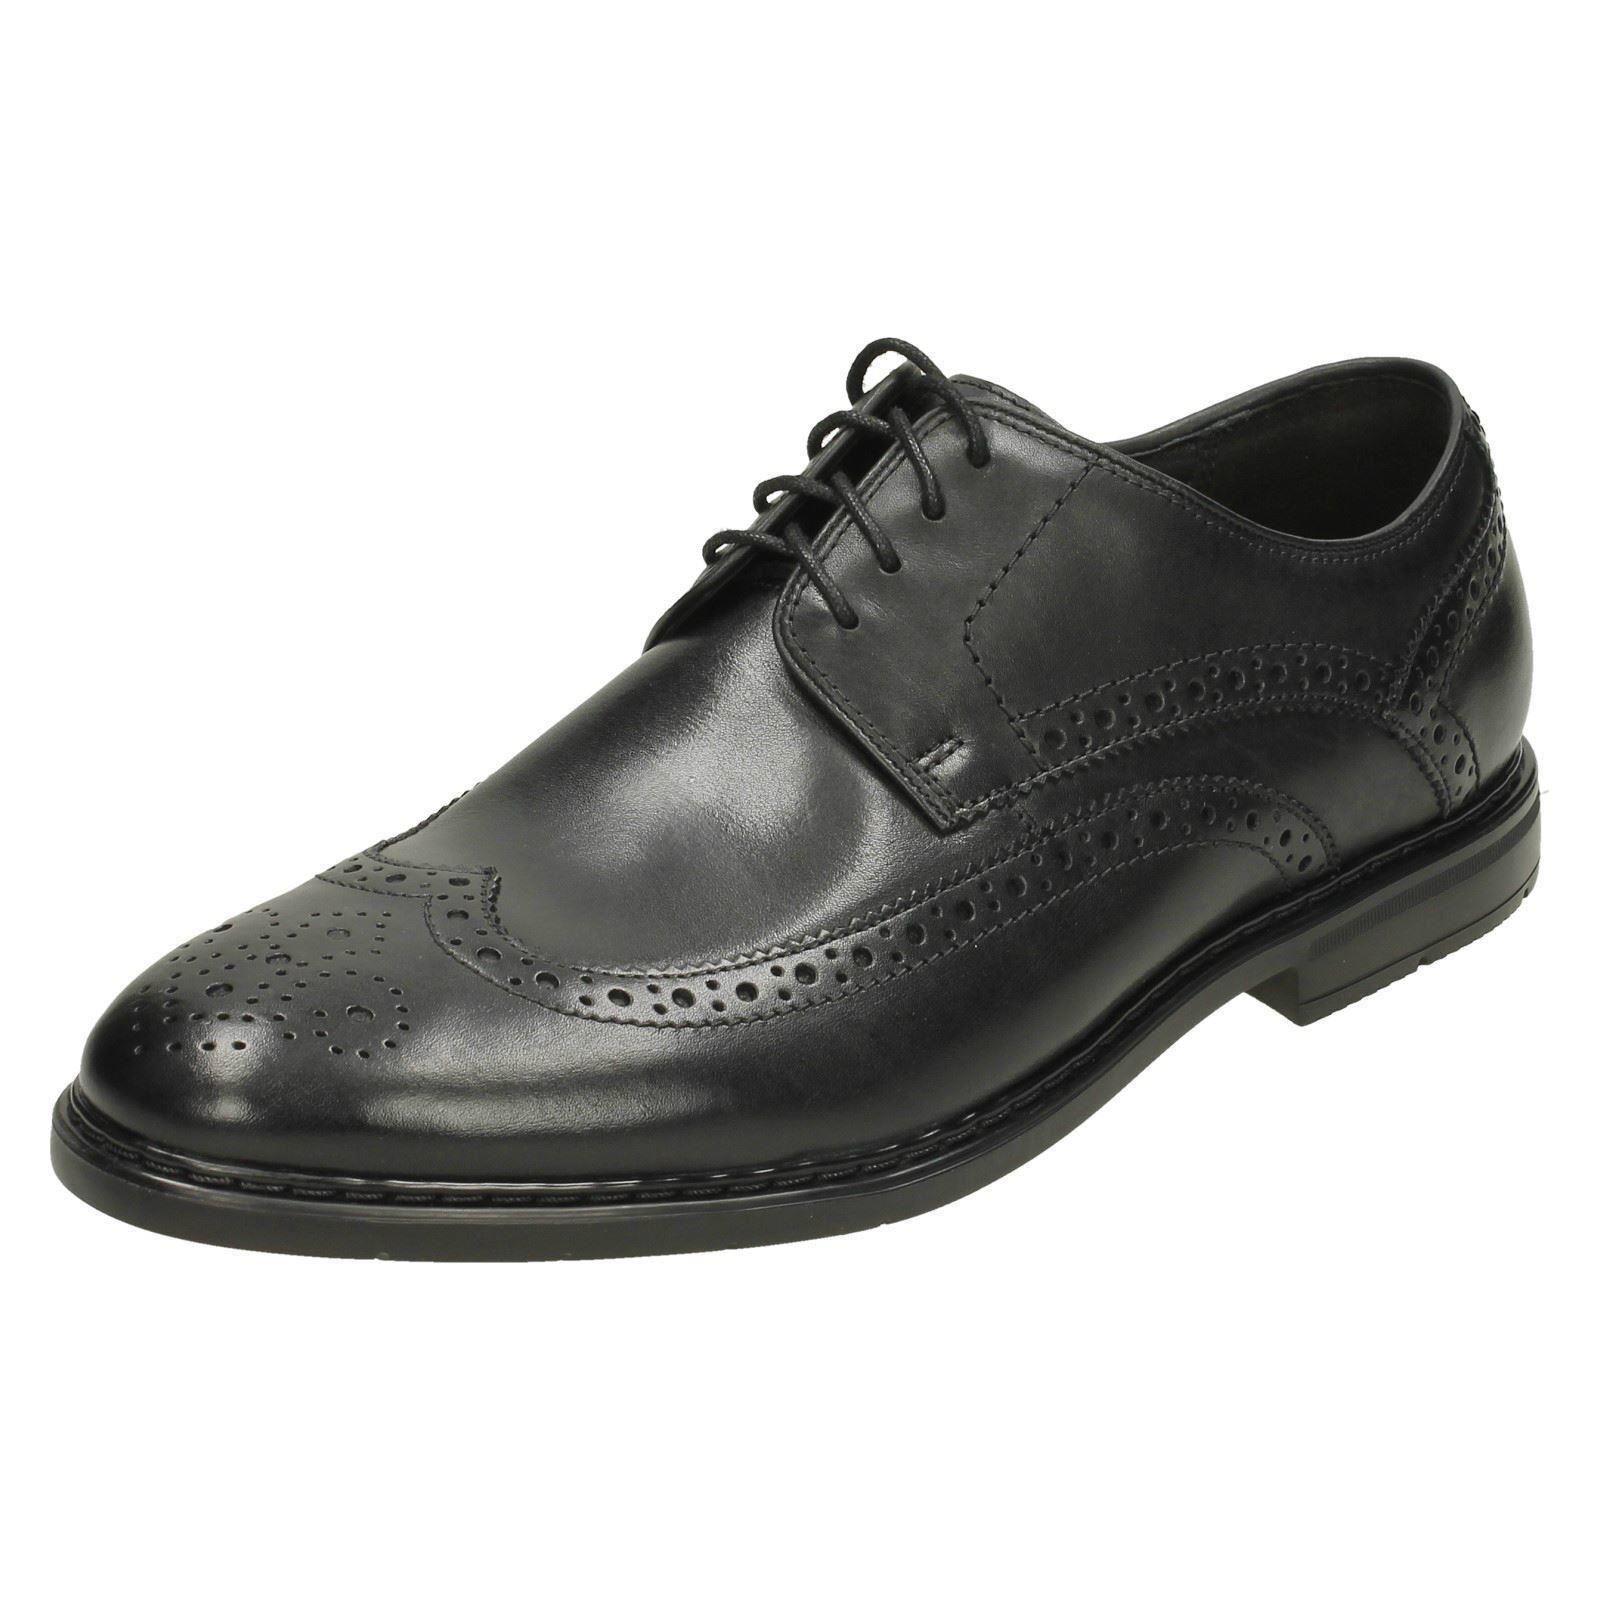 Mens Clarks Banbury Limit Formal Leather Lace Up shoes